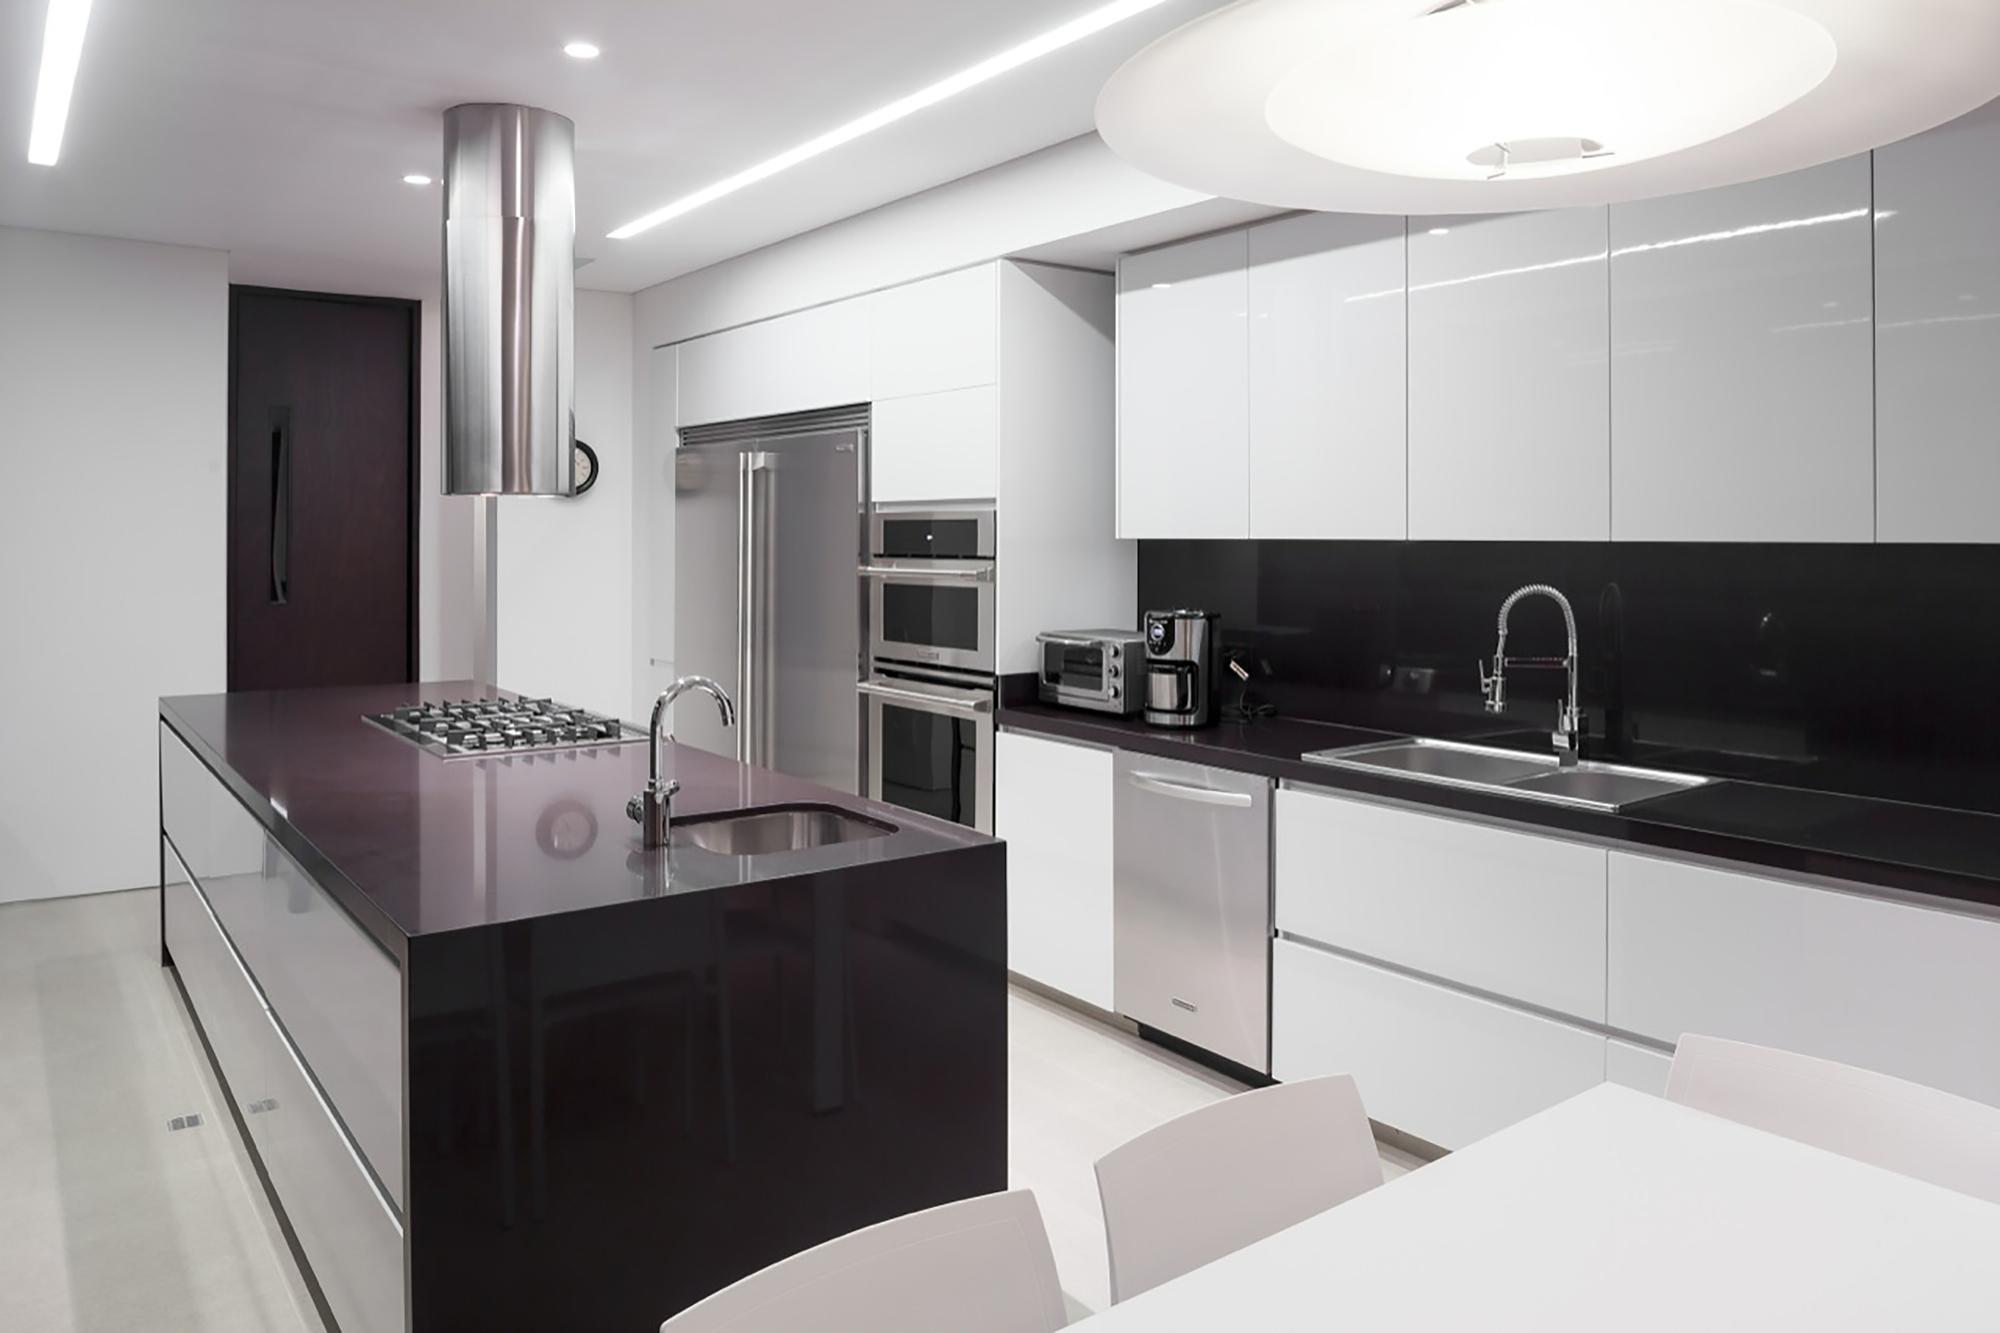 Dconfianza | Aspectos básicos para diseñar tu cocina - Dconfianza